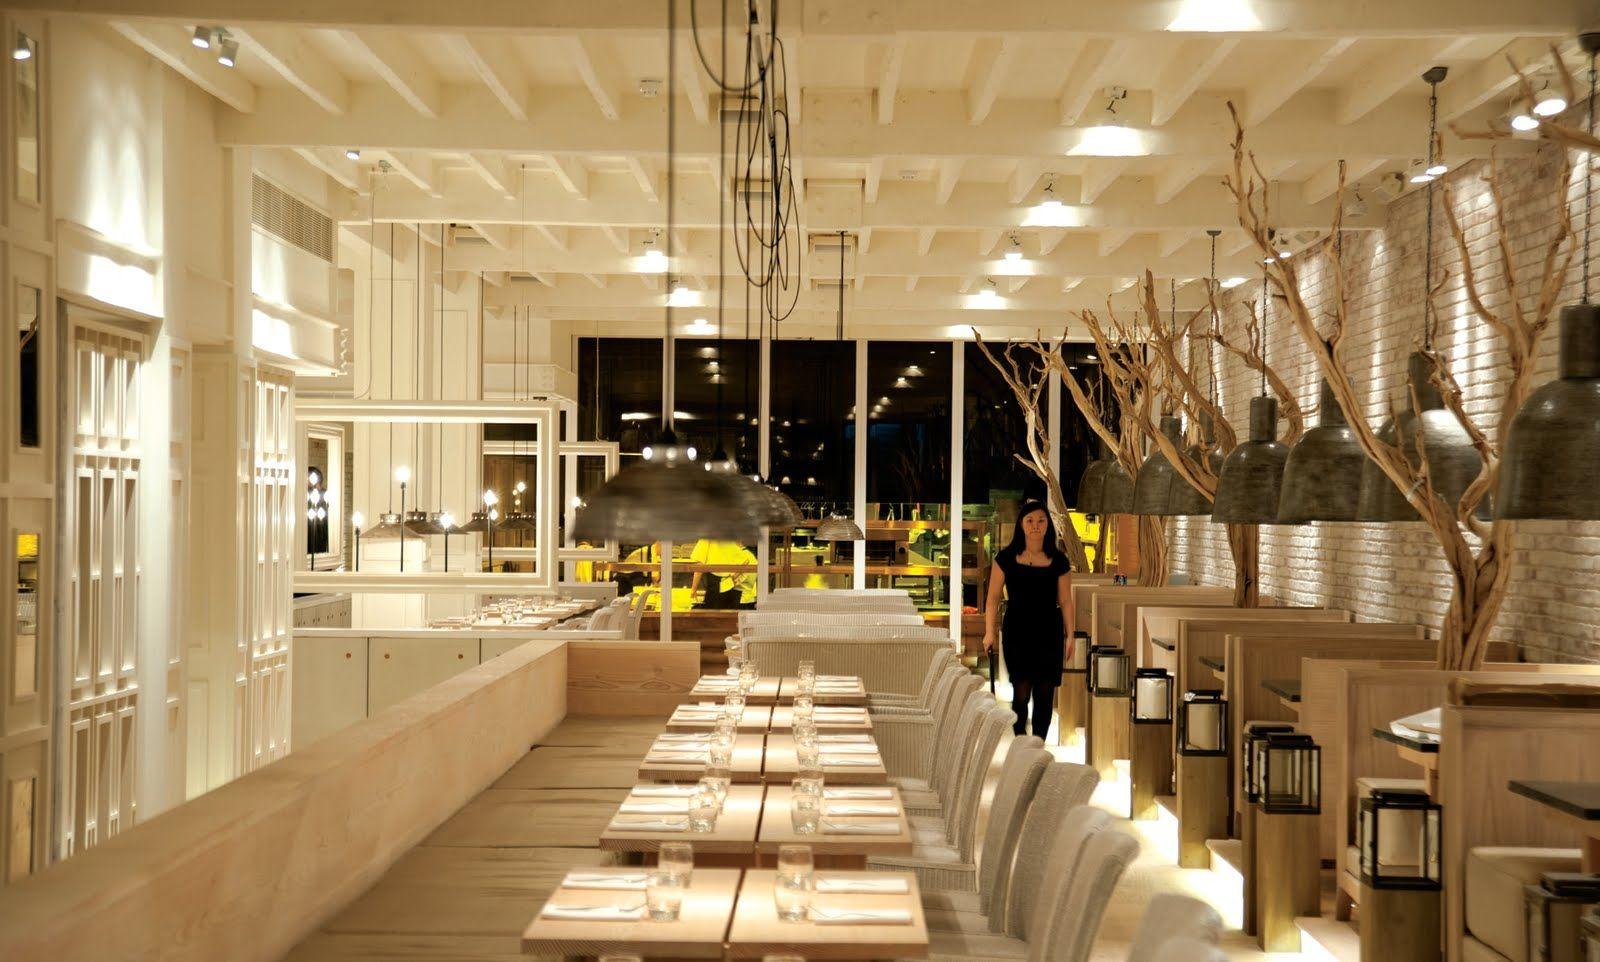 Australasia bar restaurant manchester restaurant designs to australasia bar restaurant manchester mozeypictures Gallery